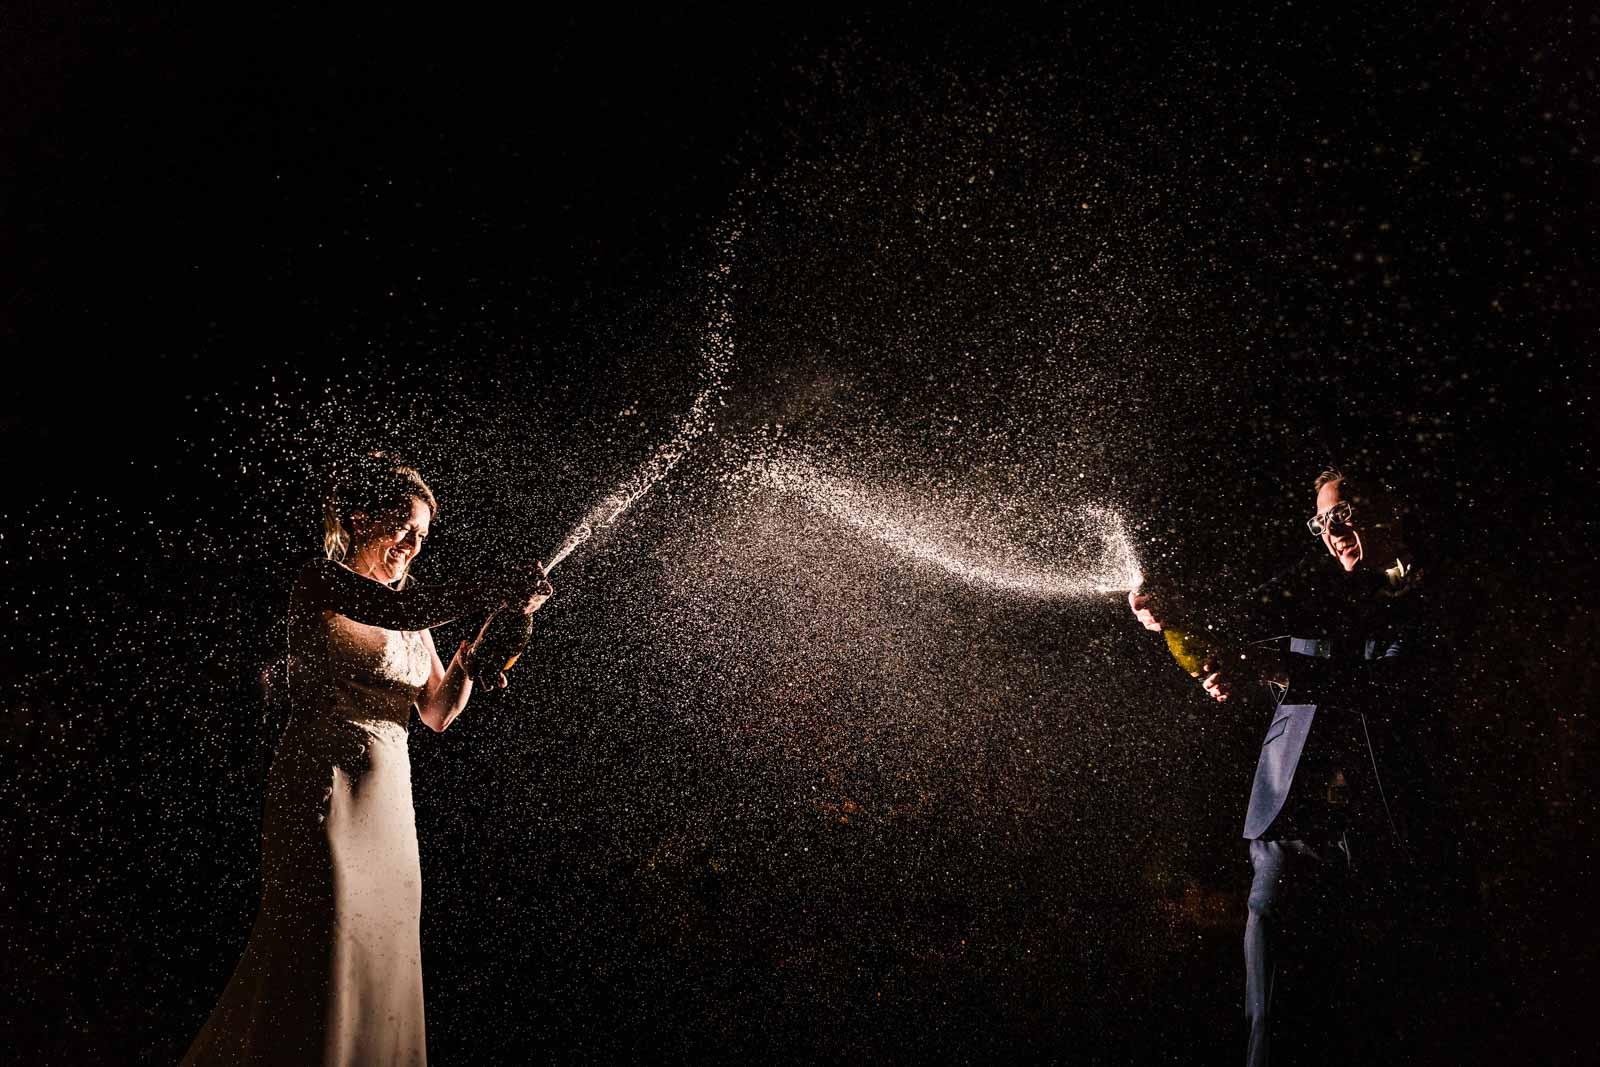 Champagne splash off camera flash photo of couple popping champagne bottle - creative wedding photography